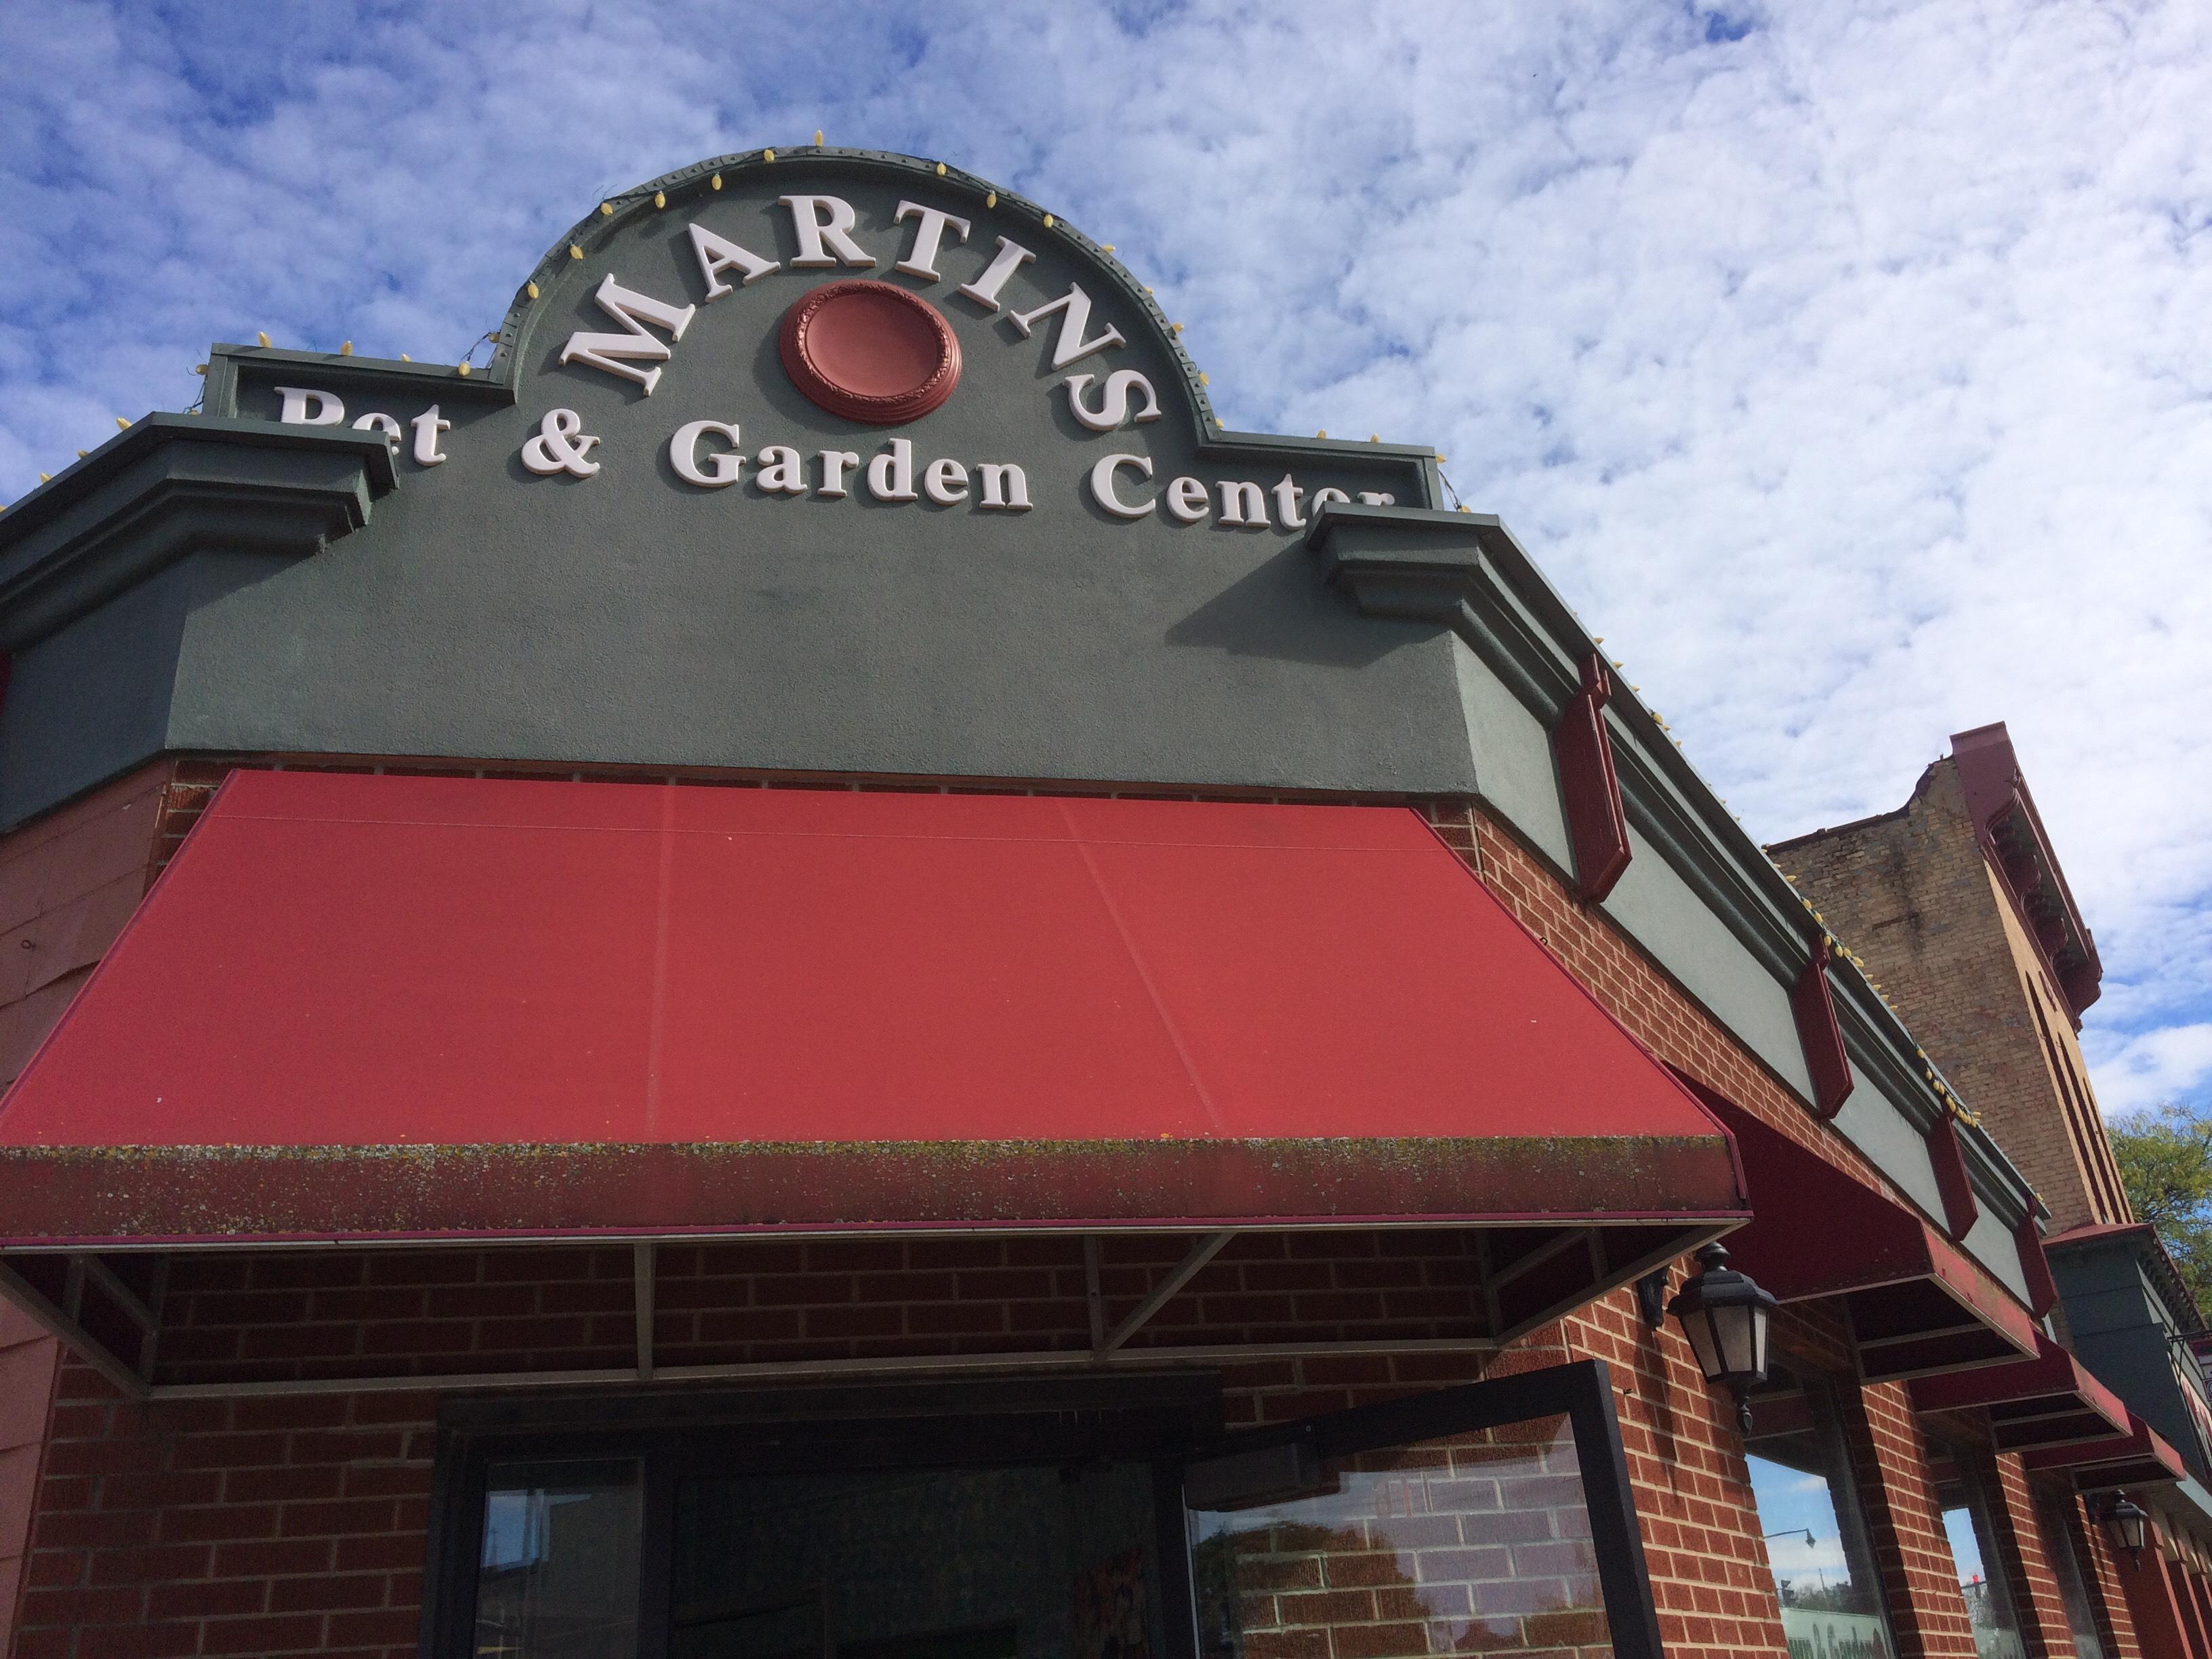 Martinu0027s Pet And Garden Center// WSBT 22